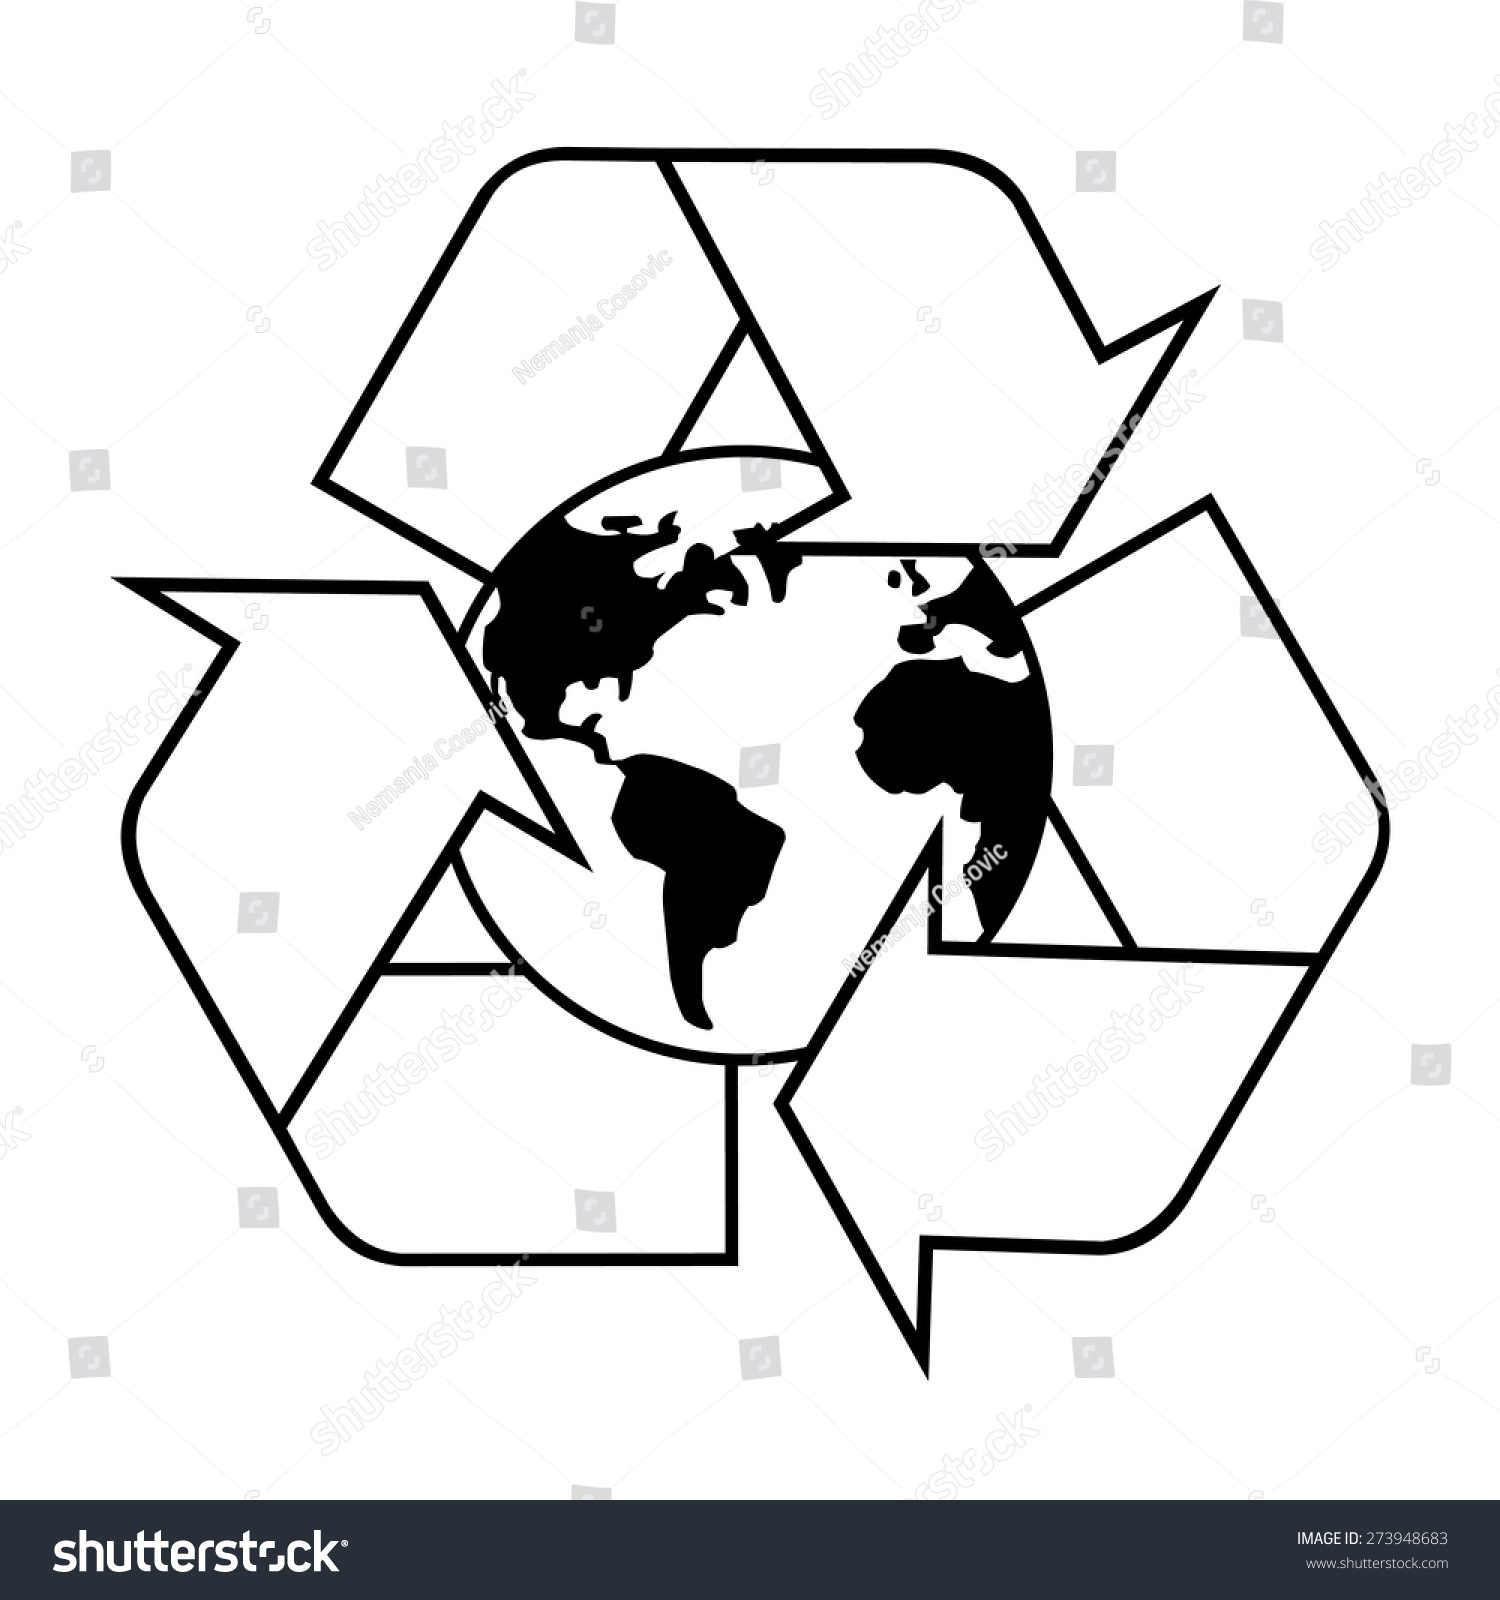 Recycle symbol planet earth black white stock vector 273948683 recycle symbol with planet earth black and white buycottarizona Choice Image